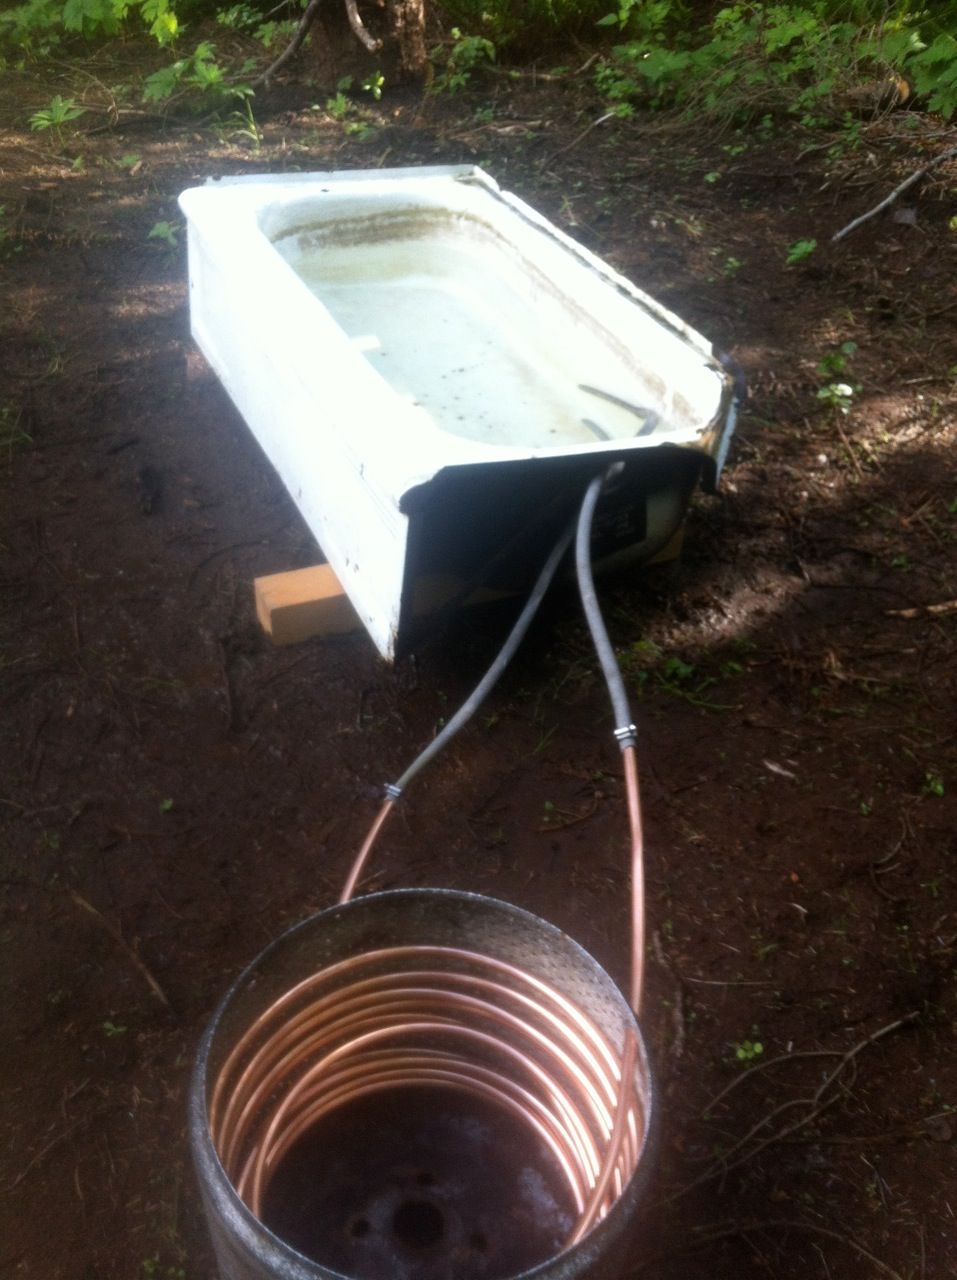 Dirtbag's Guide to Building a Backcountry Hot Tub Teton